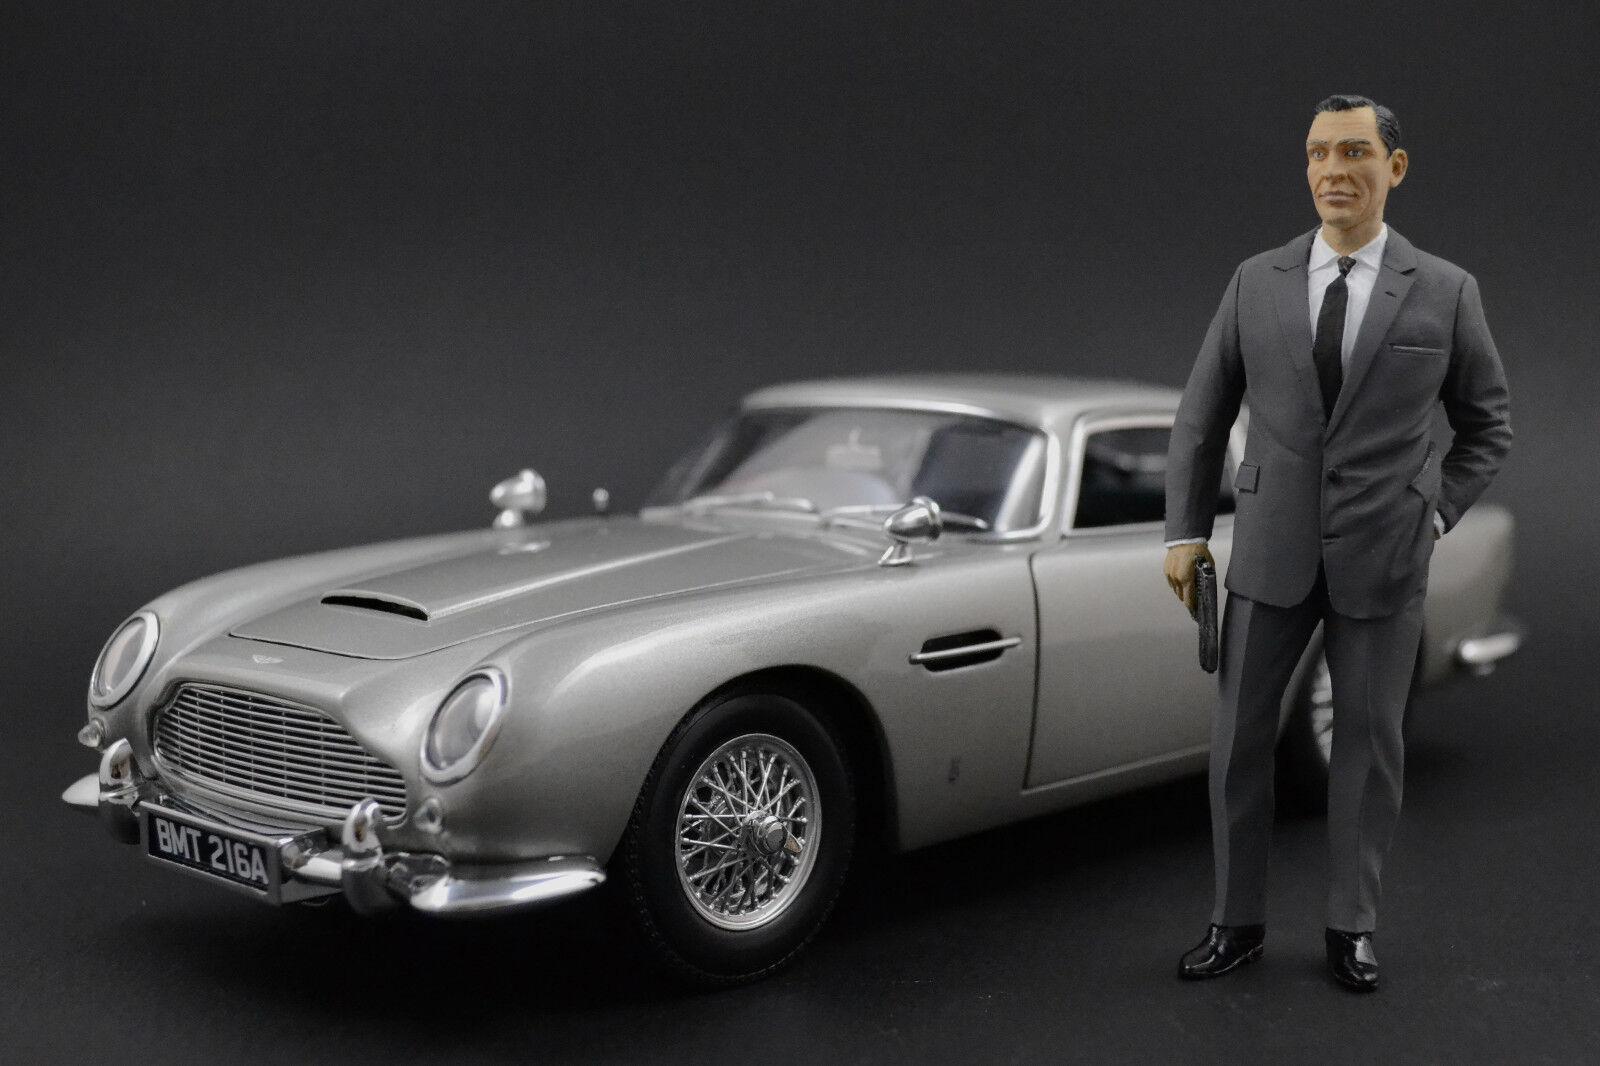 Sean Connery James Bond Figure pour 1:18 AUTOart Aston Martin DB5 DBS Vanquish